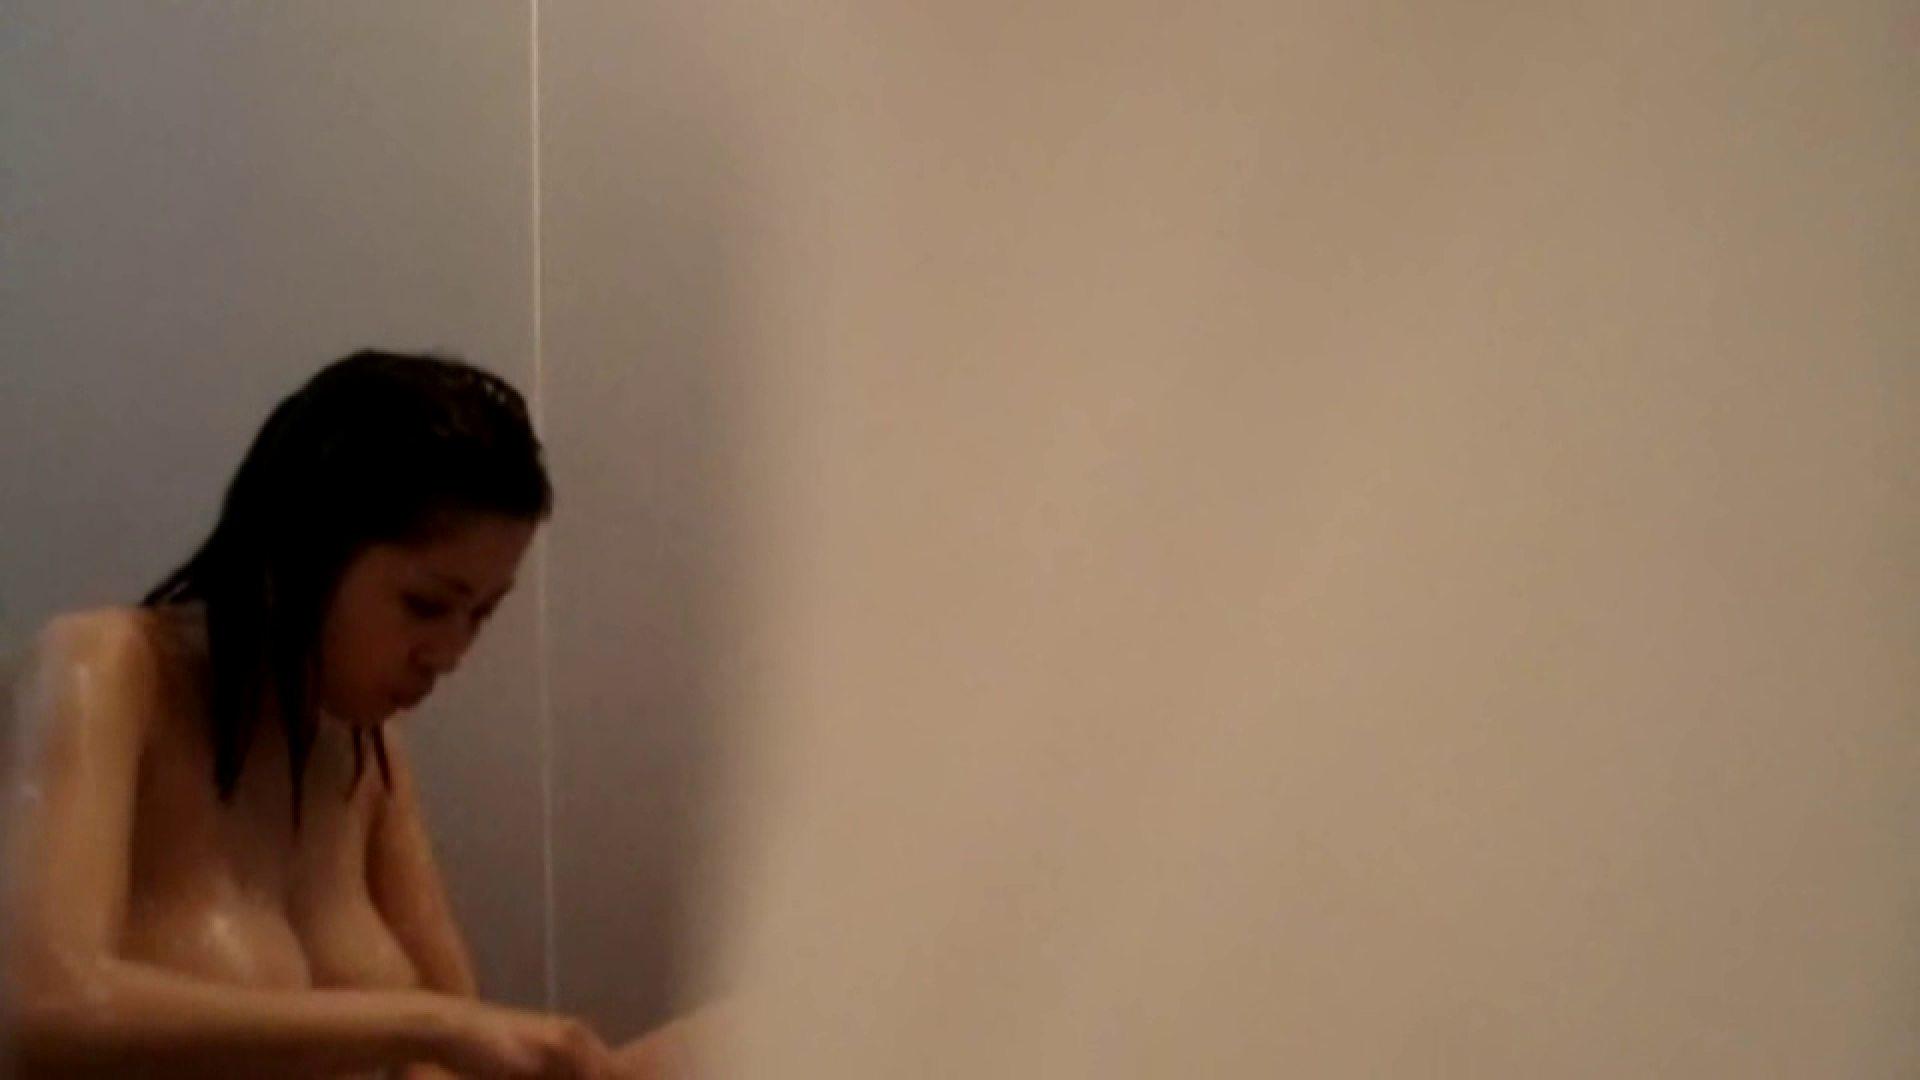 vol.2 葵のグラドル顔負けの爆乳を入浴シーンでどうぞ。 爆乳 すけべAV動画紹介 64PIX 59